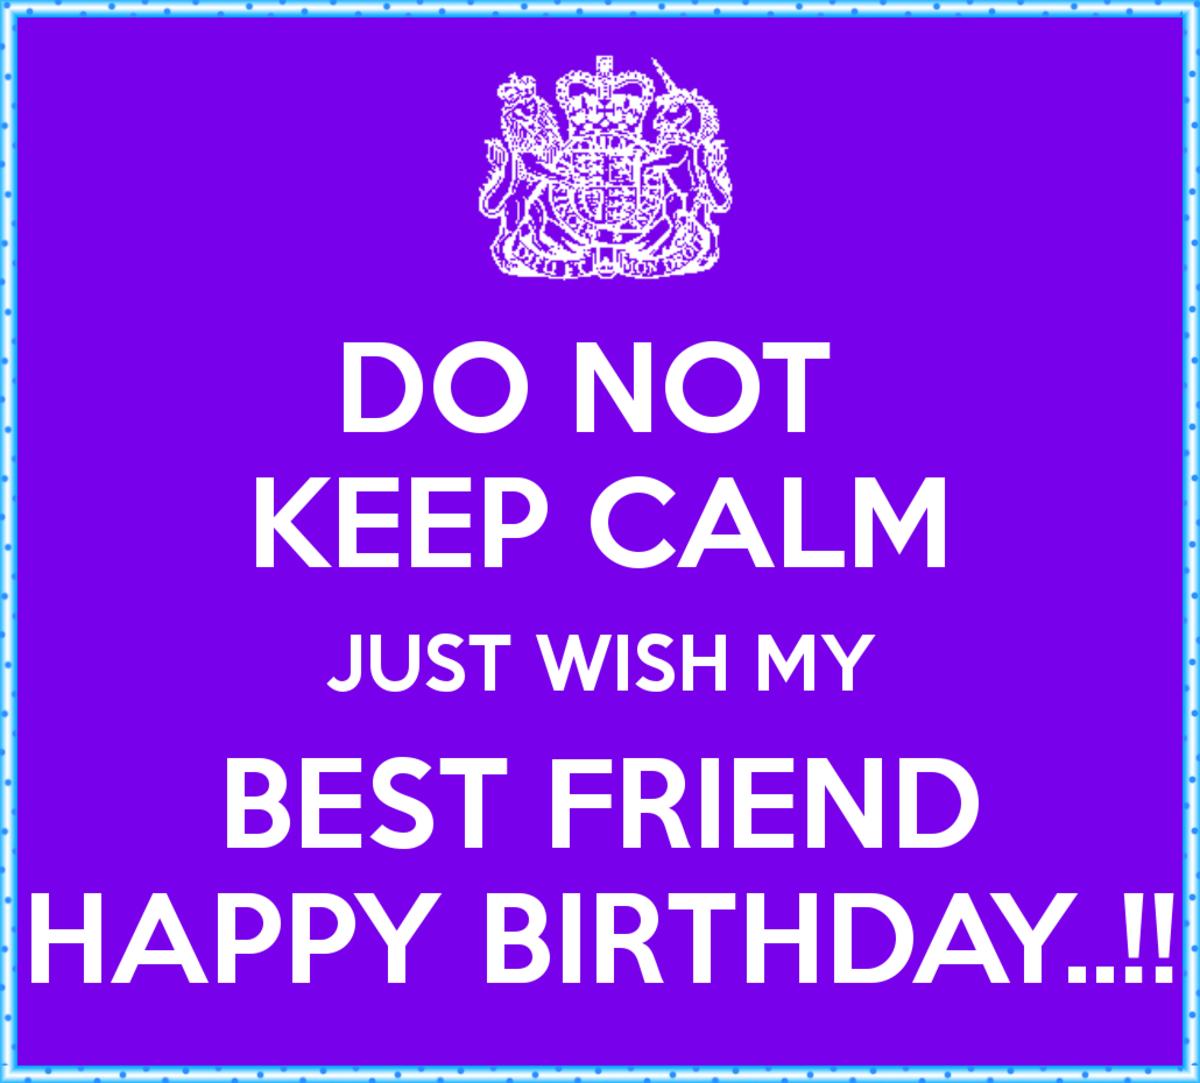 Happy Birthday Letter For Best Friend Boy Birthday Wishes For Best